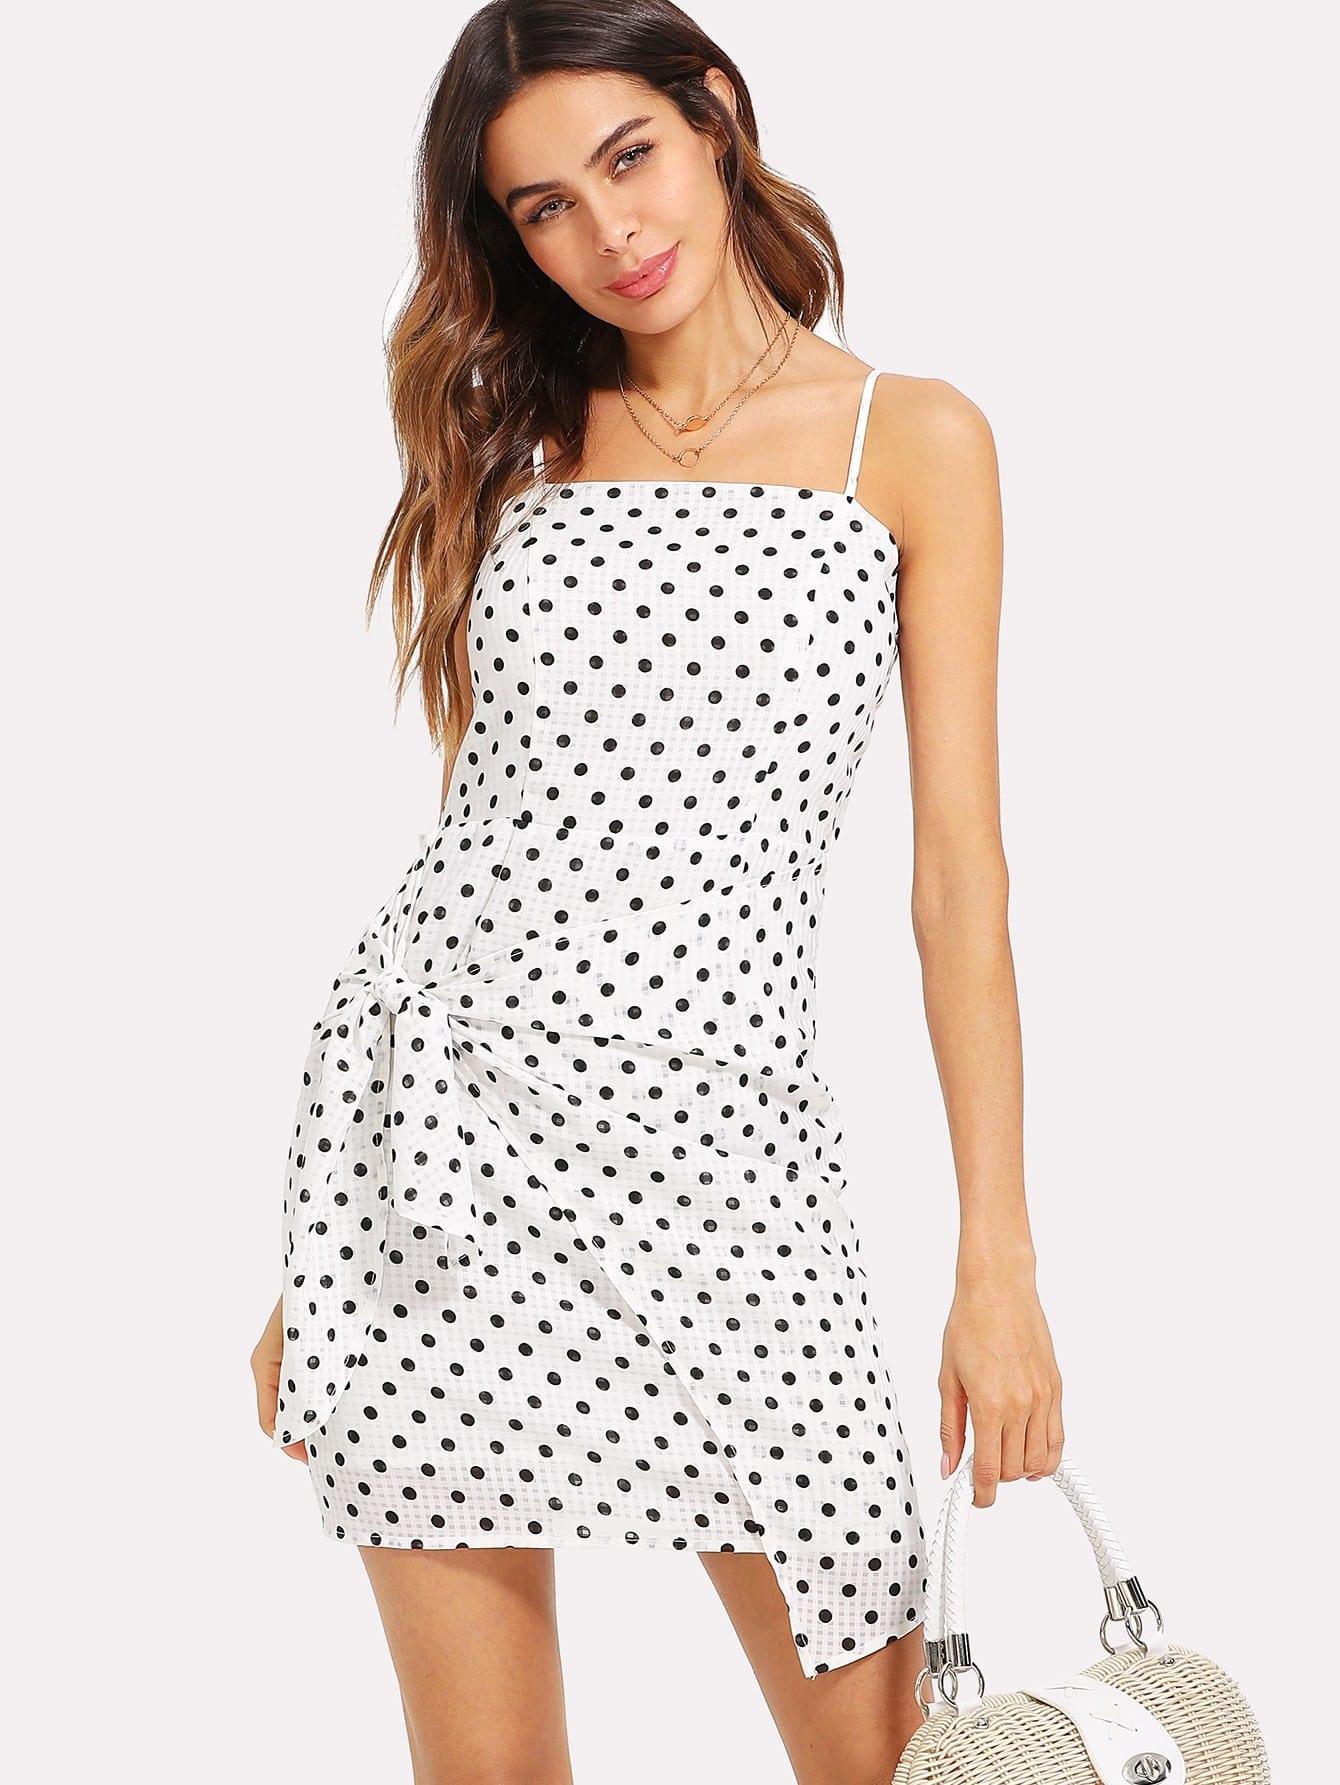 Polka Dot Bow Tie Back Wrap Cami Dress rabbit print polka dot tie back dress